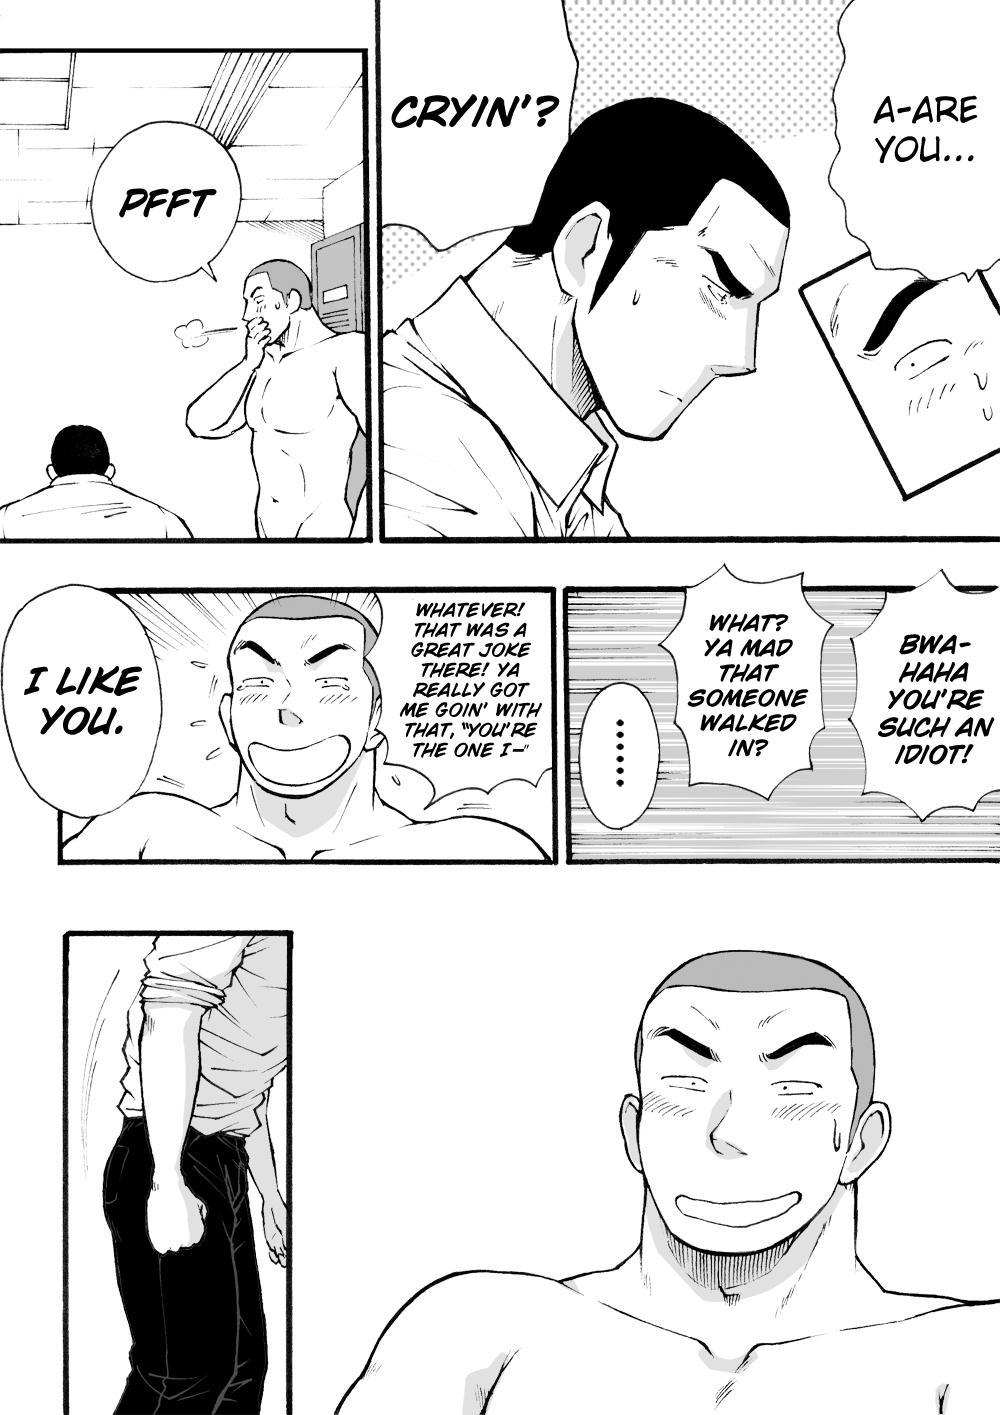 [Akahachi] Motemote Yakyuubu Otoko [Kouhen] | Popular Baseball Club Boys (Part Two) [English] [Papatez] 18